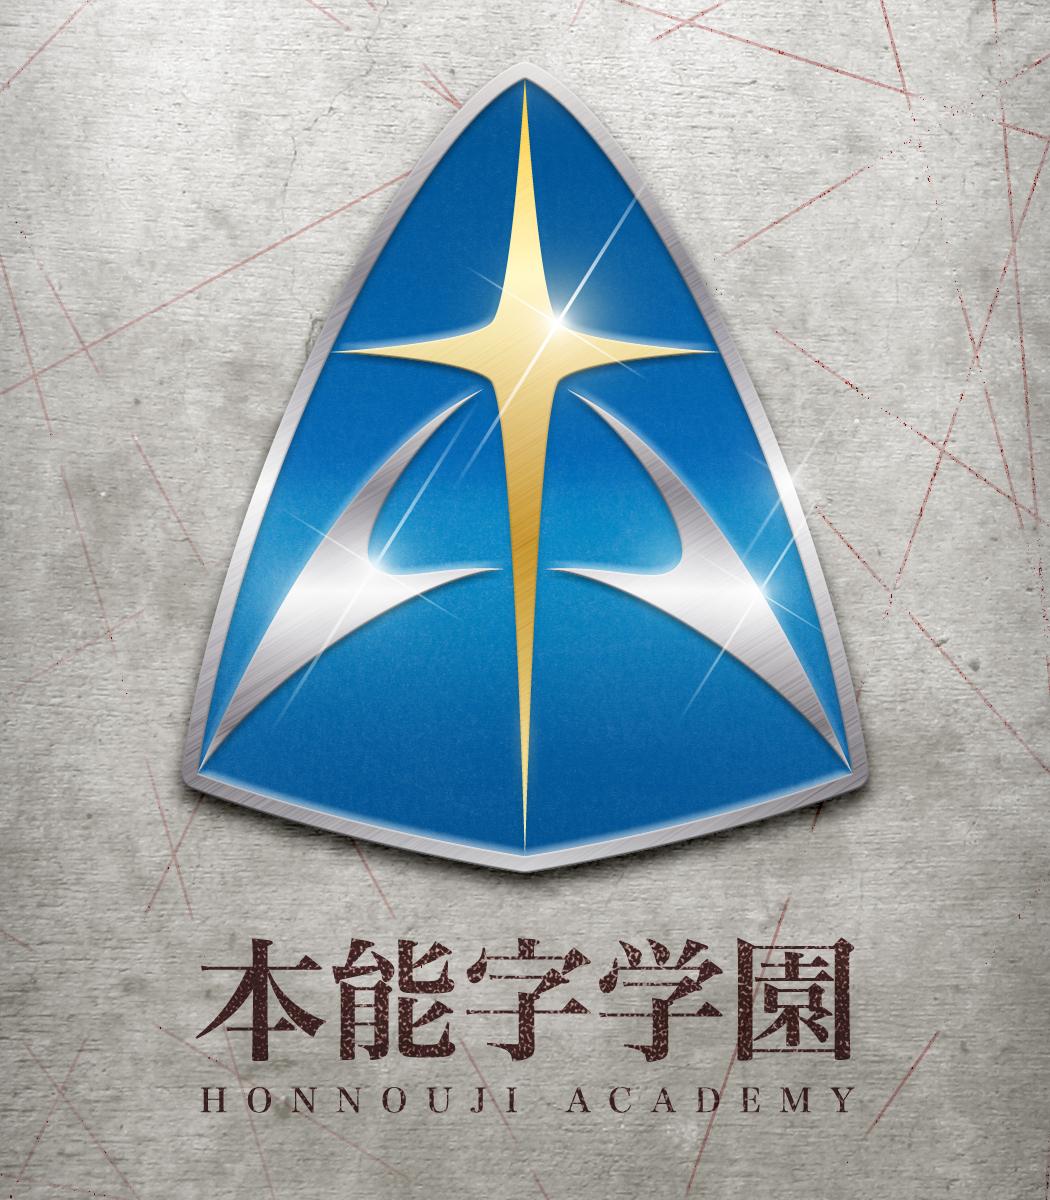 Honnouji Emblem Wallpaper Pack by cow41087